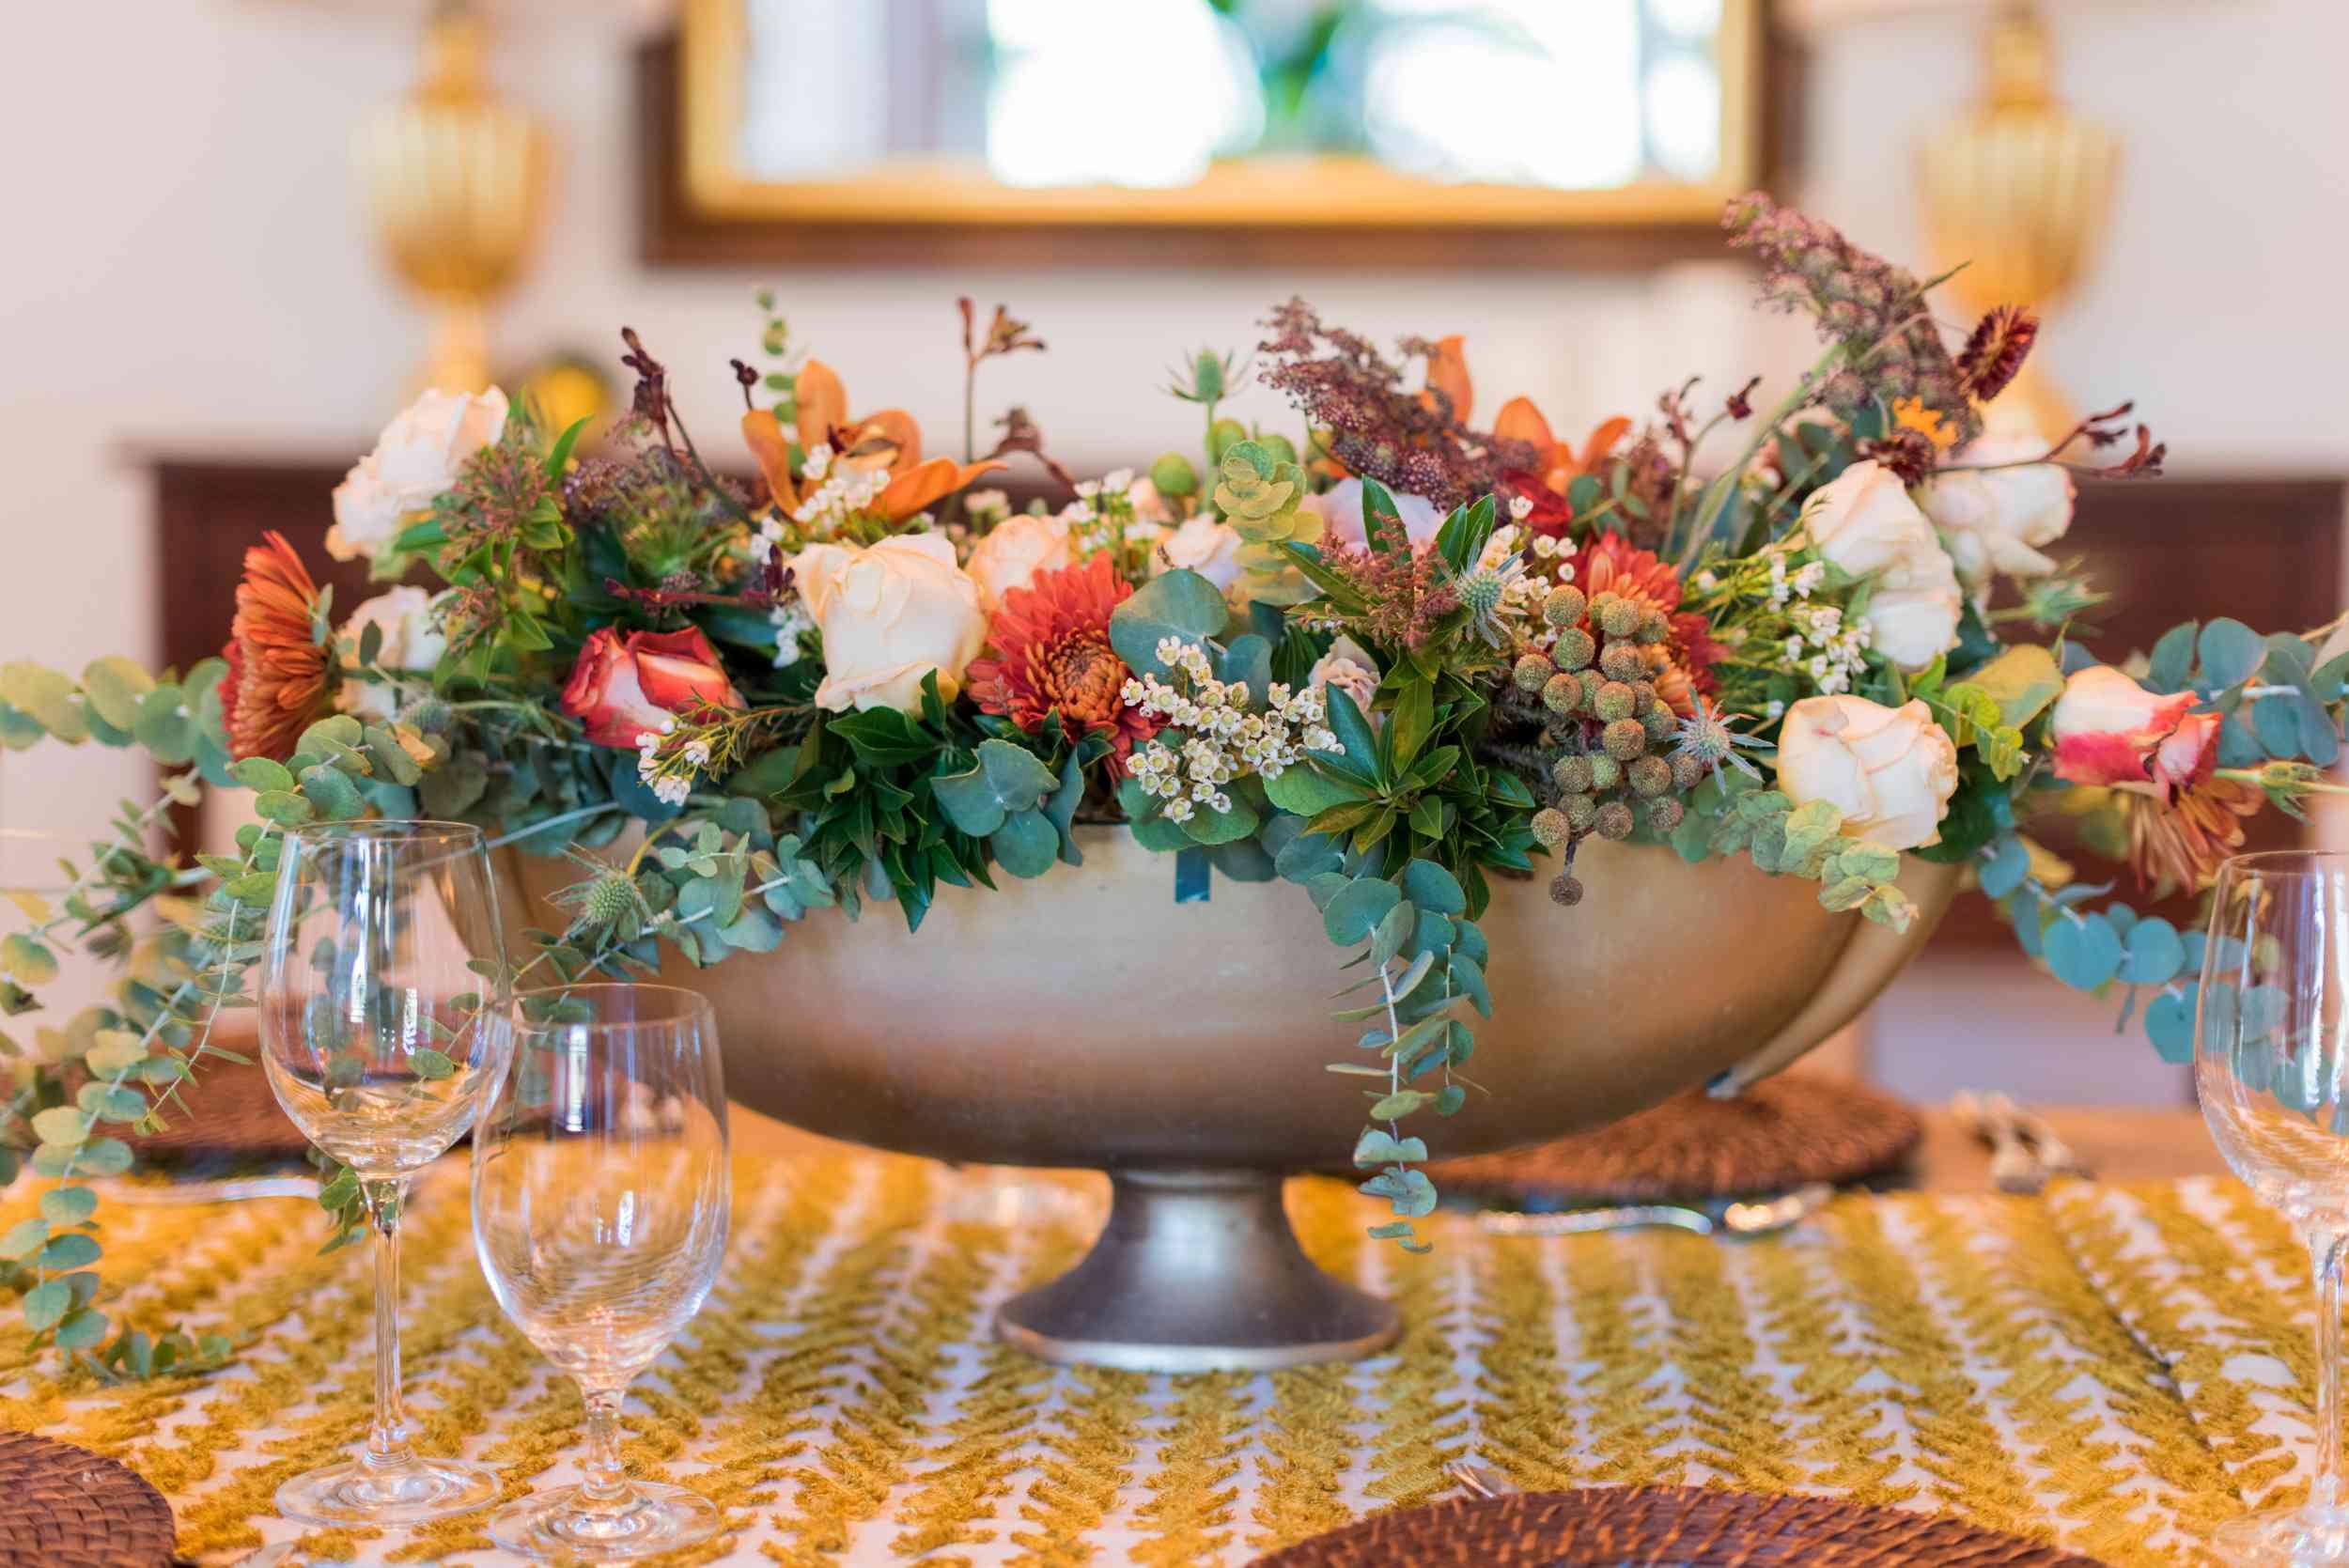 Large floral arrangement for fall tablescape